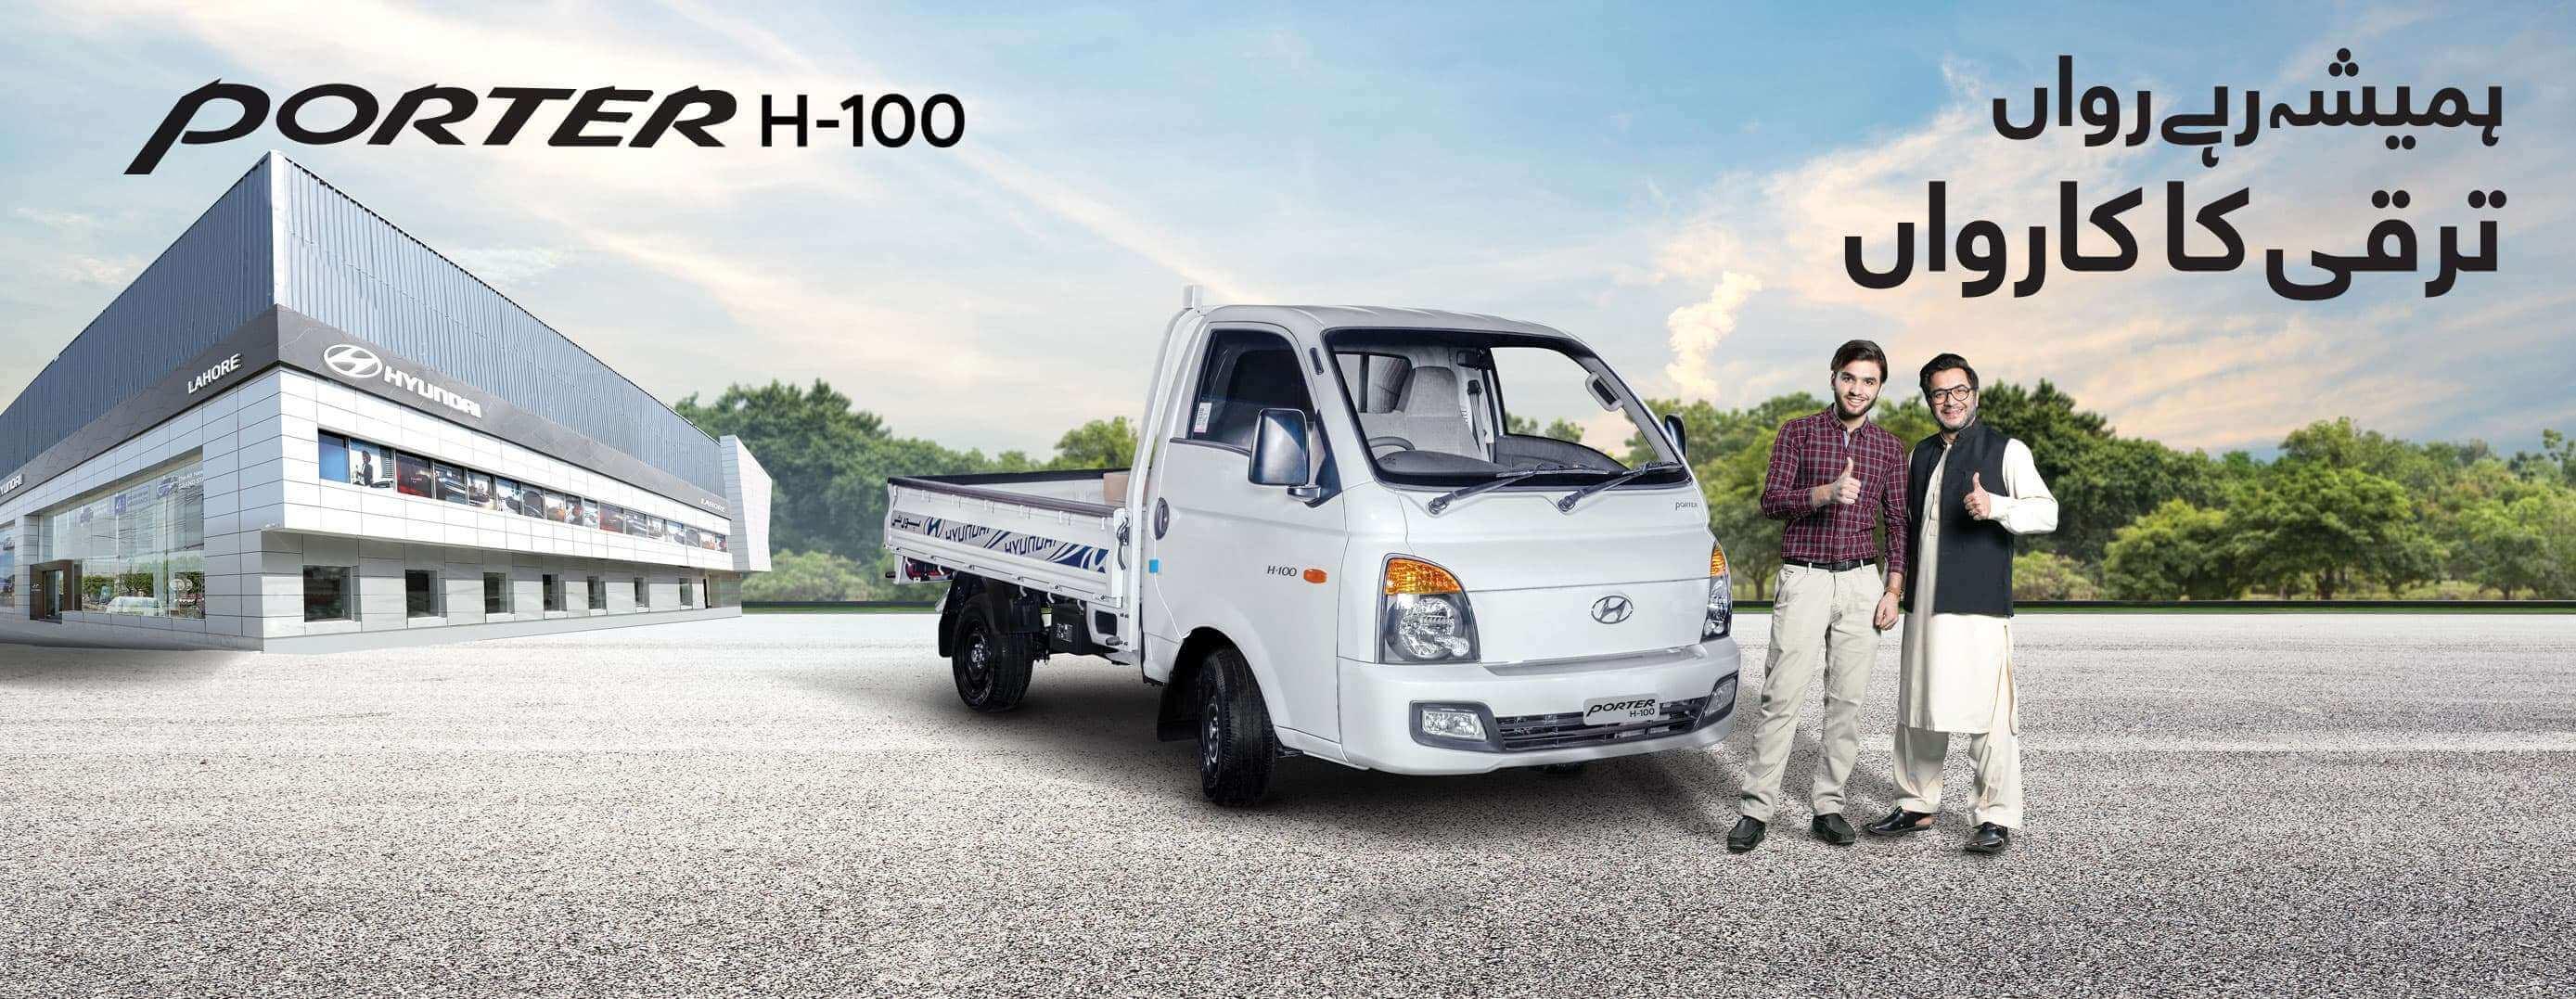 Porter H-100 - Hyundai Central